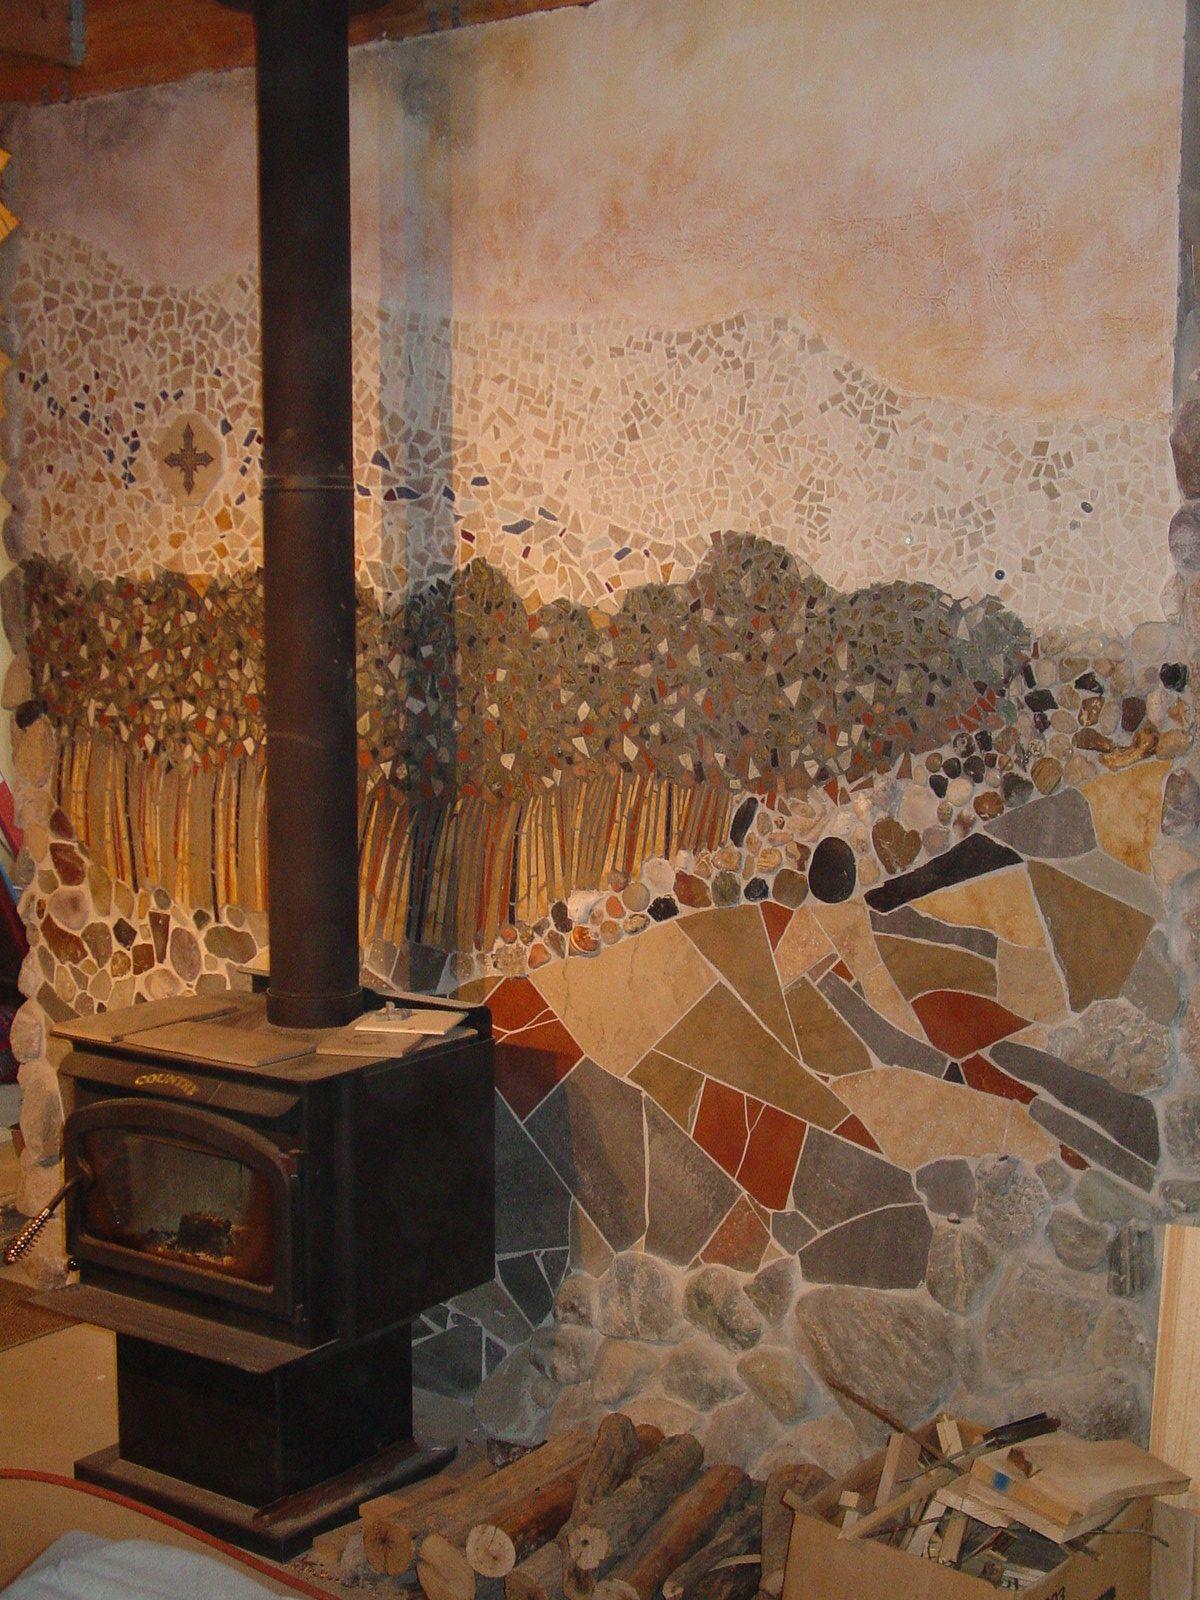 Of posts ceramic tile advice forums john bridge ceramic tile - Ceramic Tile Landscape With Stones 8x8 Wall Behind Wood Stove Sharon Smithem